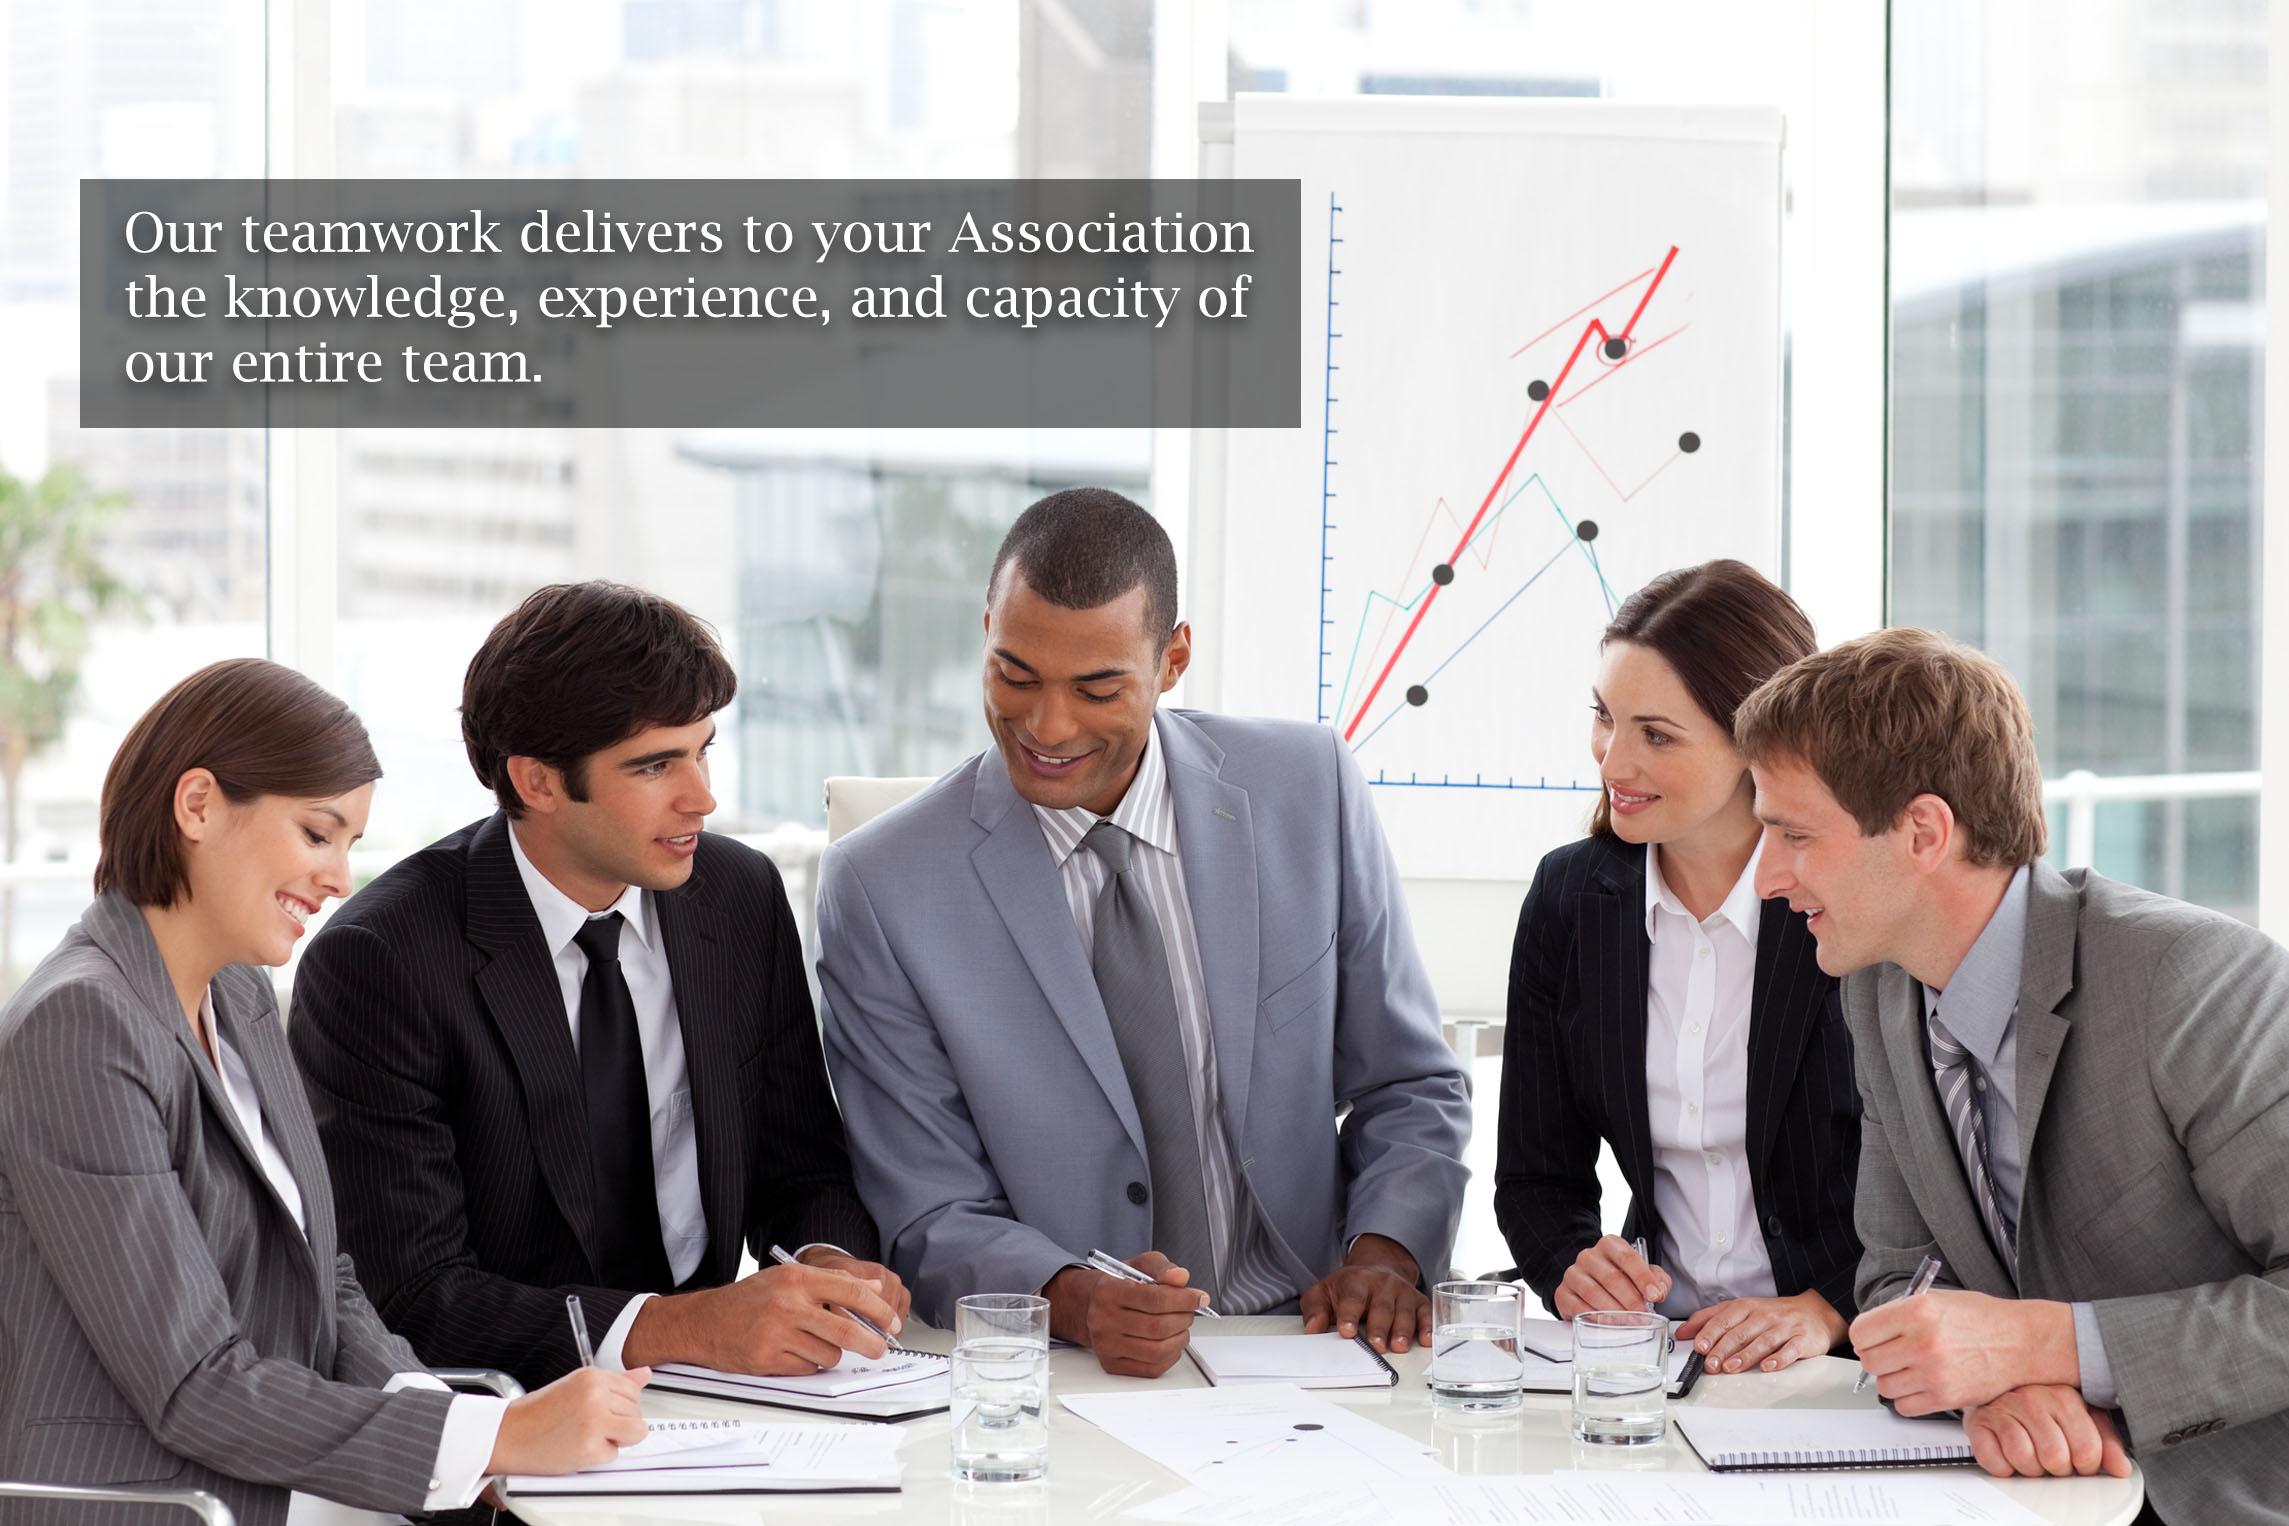 association management employees using teamwork in meeting